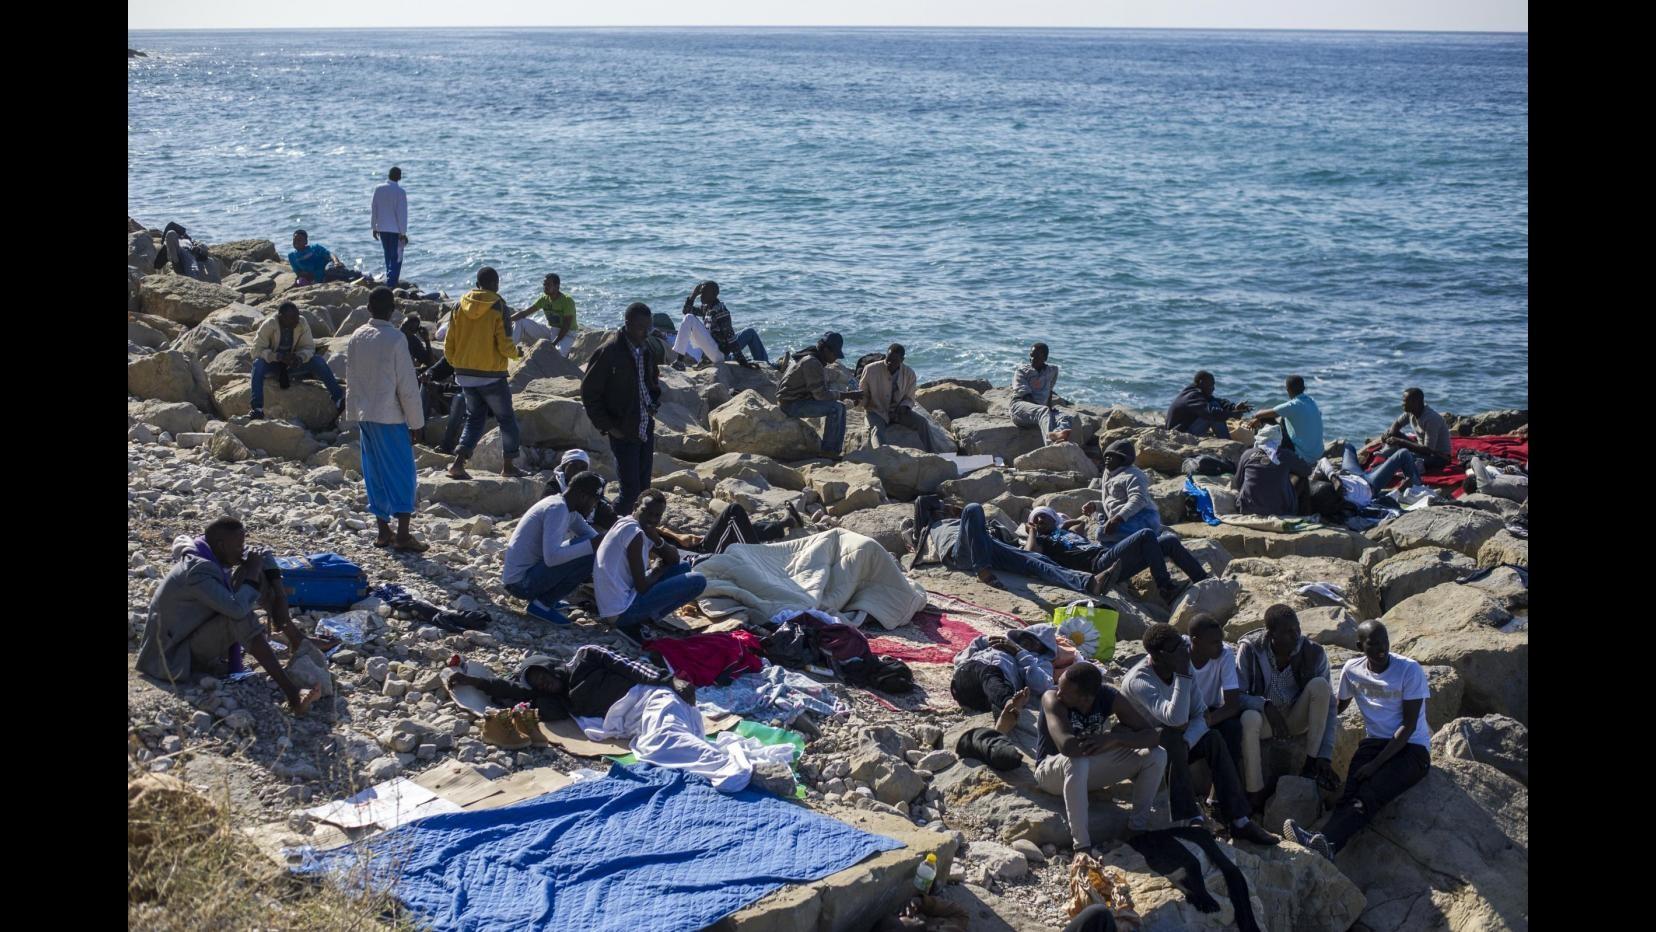 Giornata rifugiato, Ban Ki-moon: Un profugo ogni 122 persone nel mondo